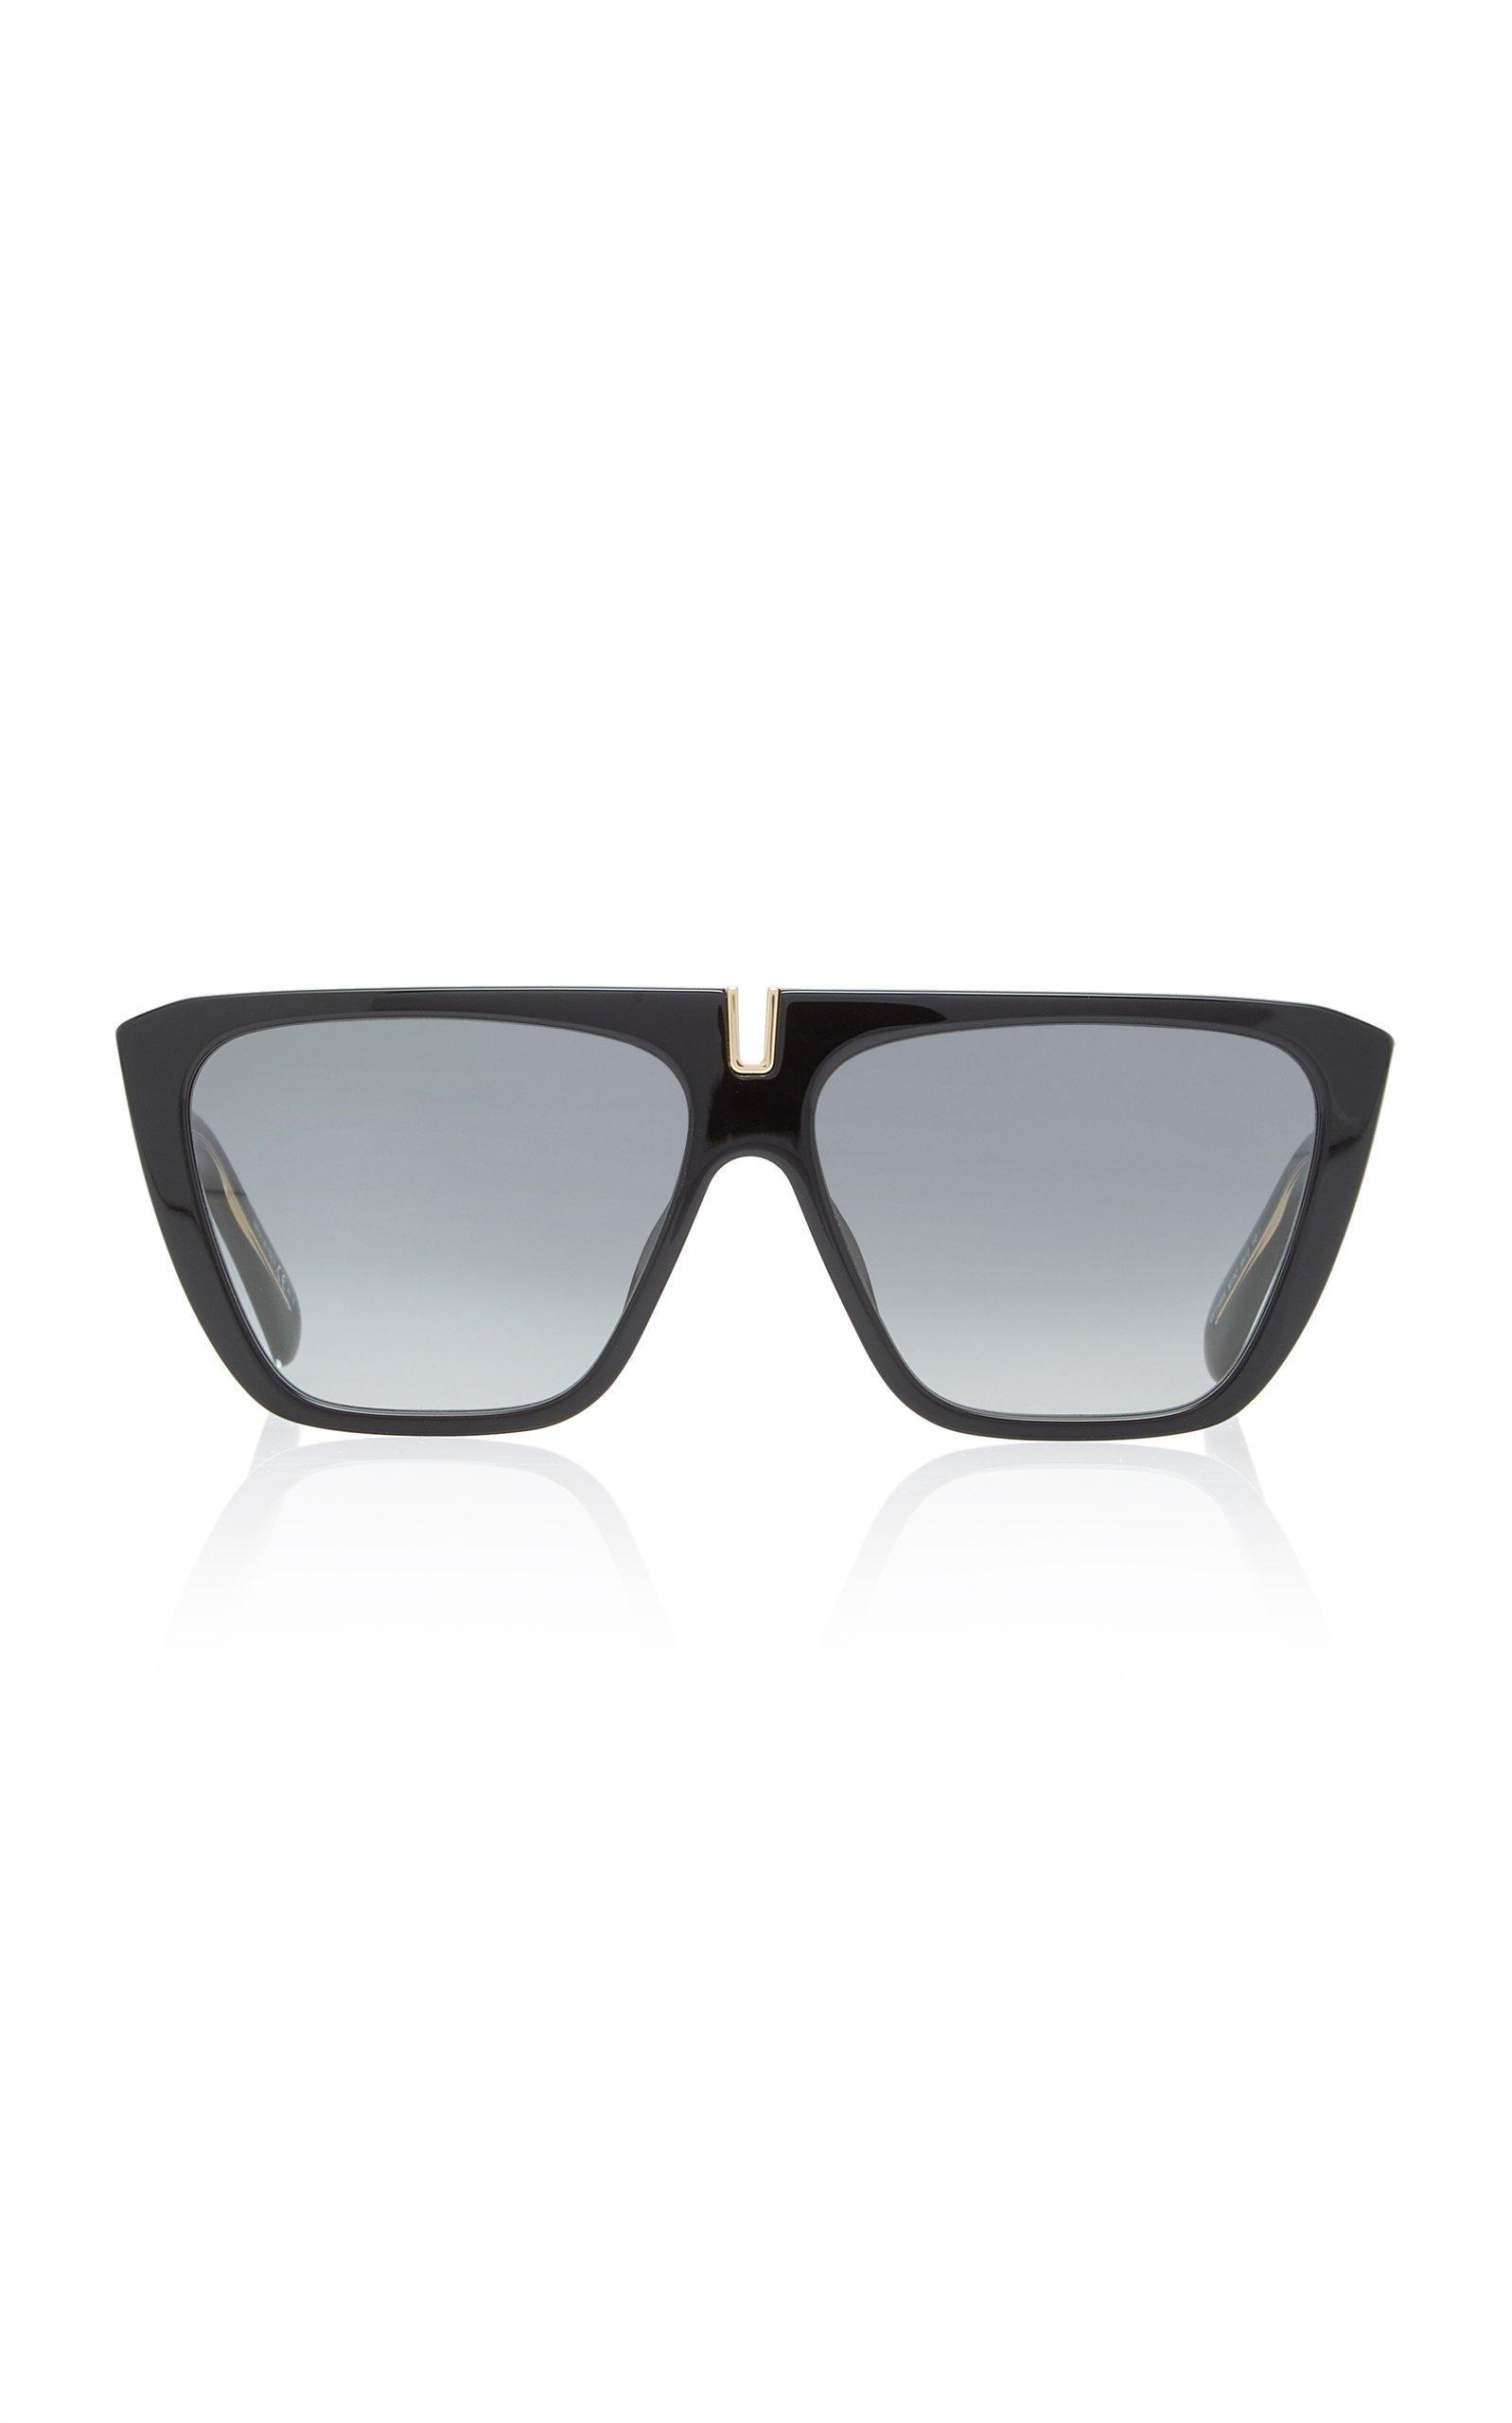 Givenchy Sunglasses Oversized Square-Frame Acetate Sunglasses